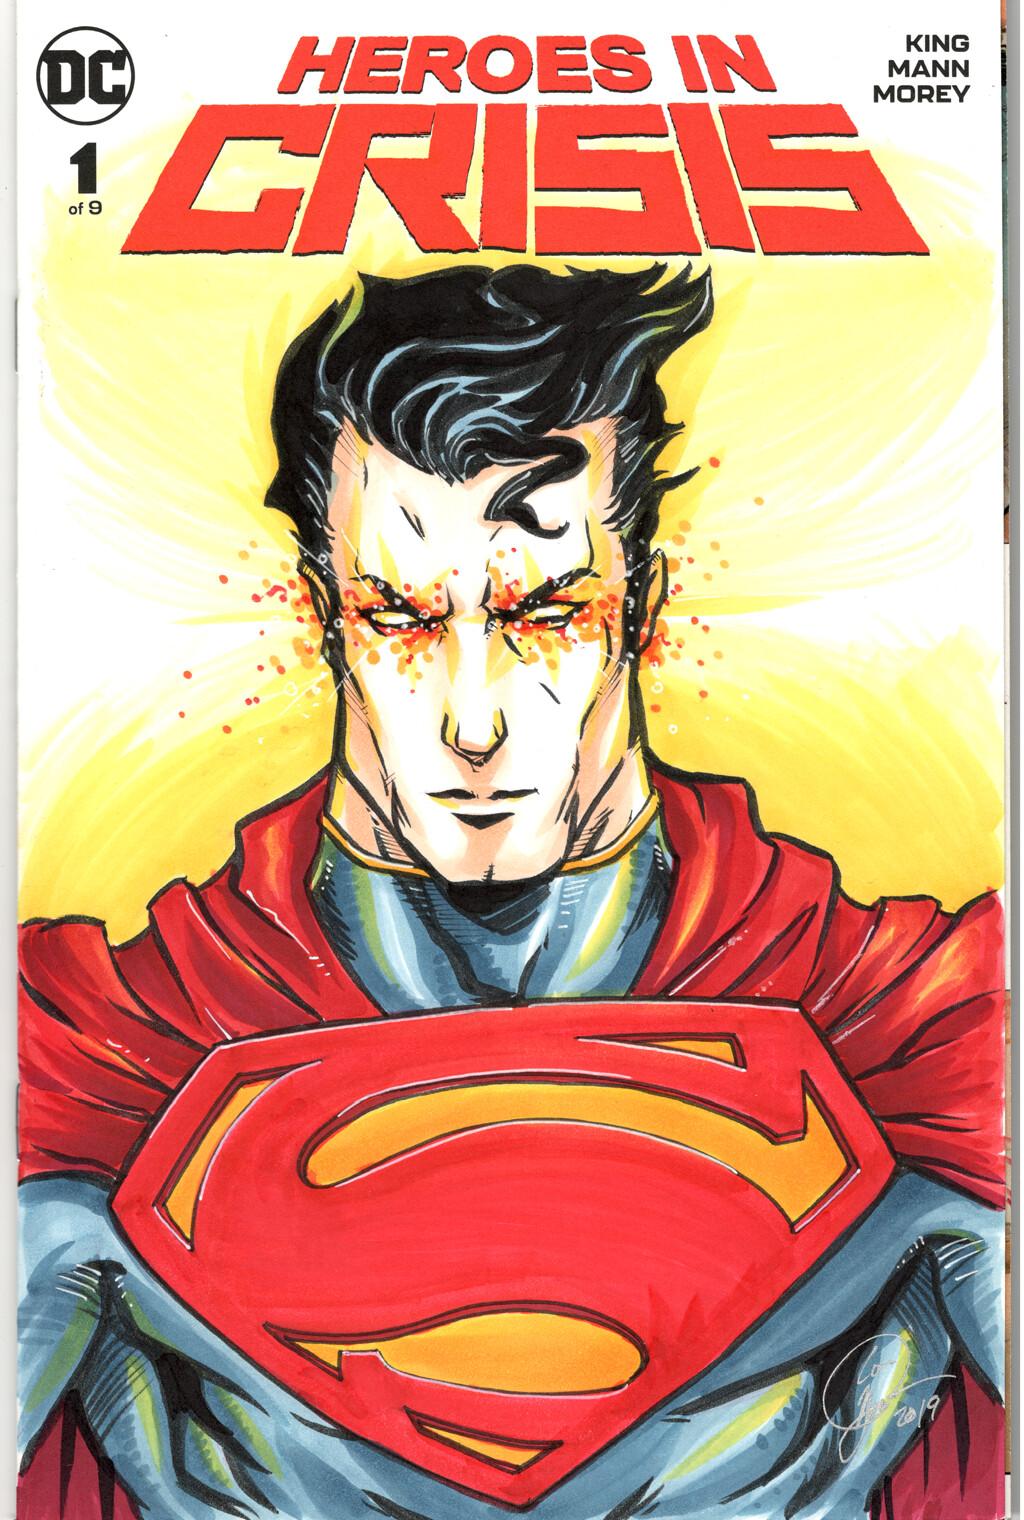 Loc nguyen heroes in crisis superman sketchcover by loc nguyen